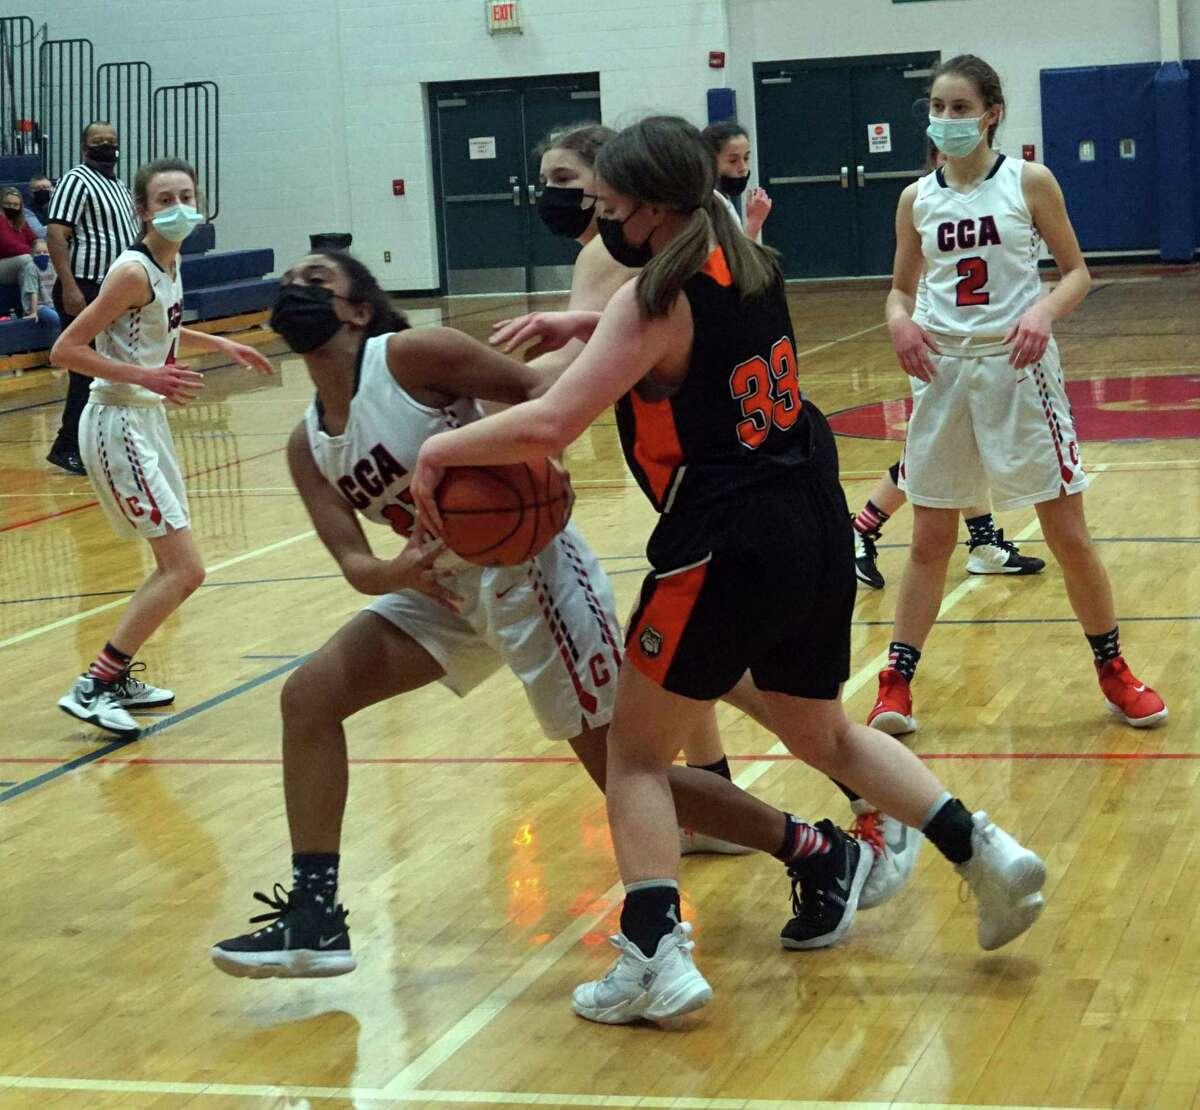 Crossroads Charter Academy's Samara Turner battles for possession of the ball with Mesick's Mattie Akom during Thursday night's girls' basketball game. (Pioneer photo/Joe Judd)